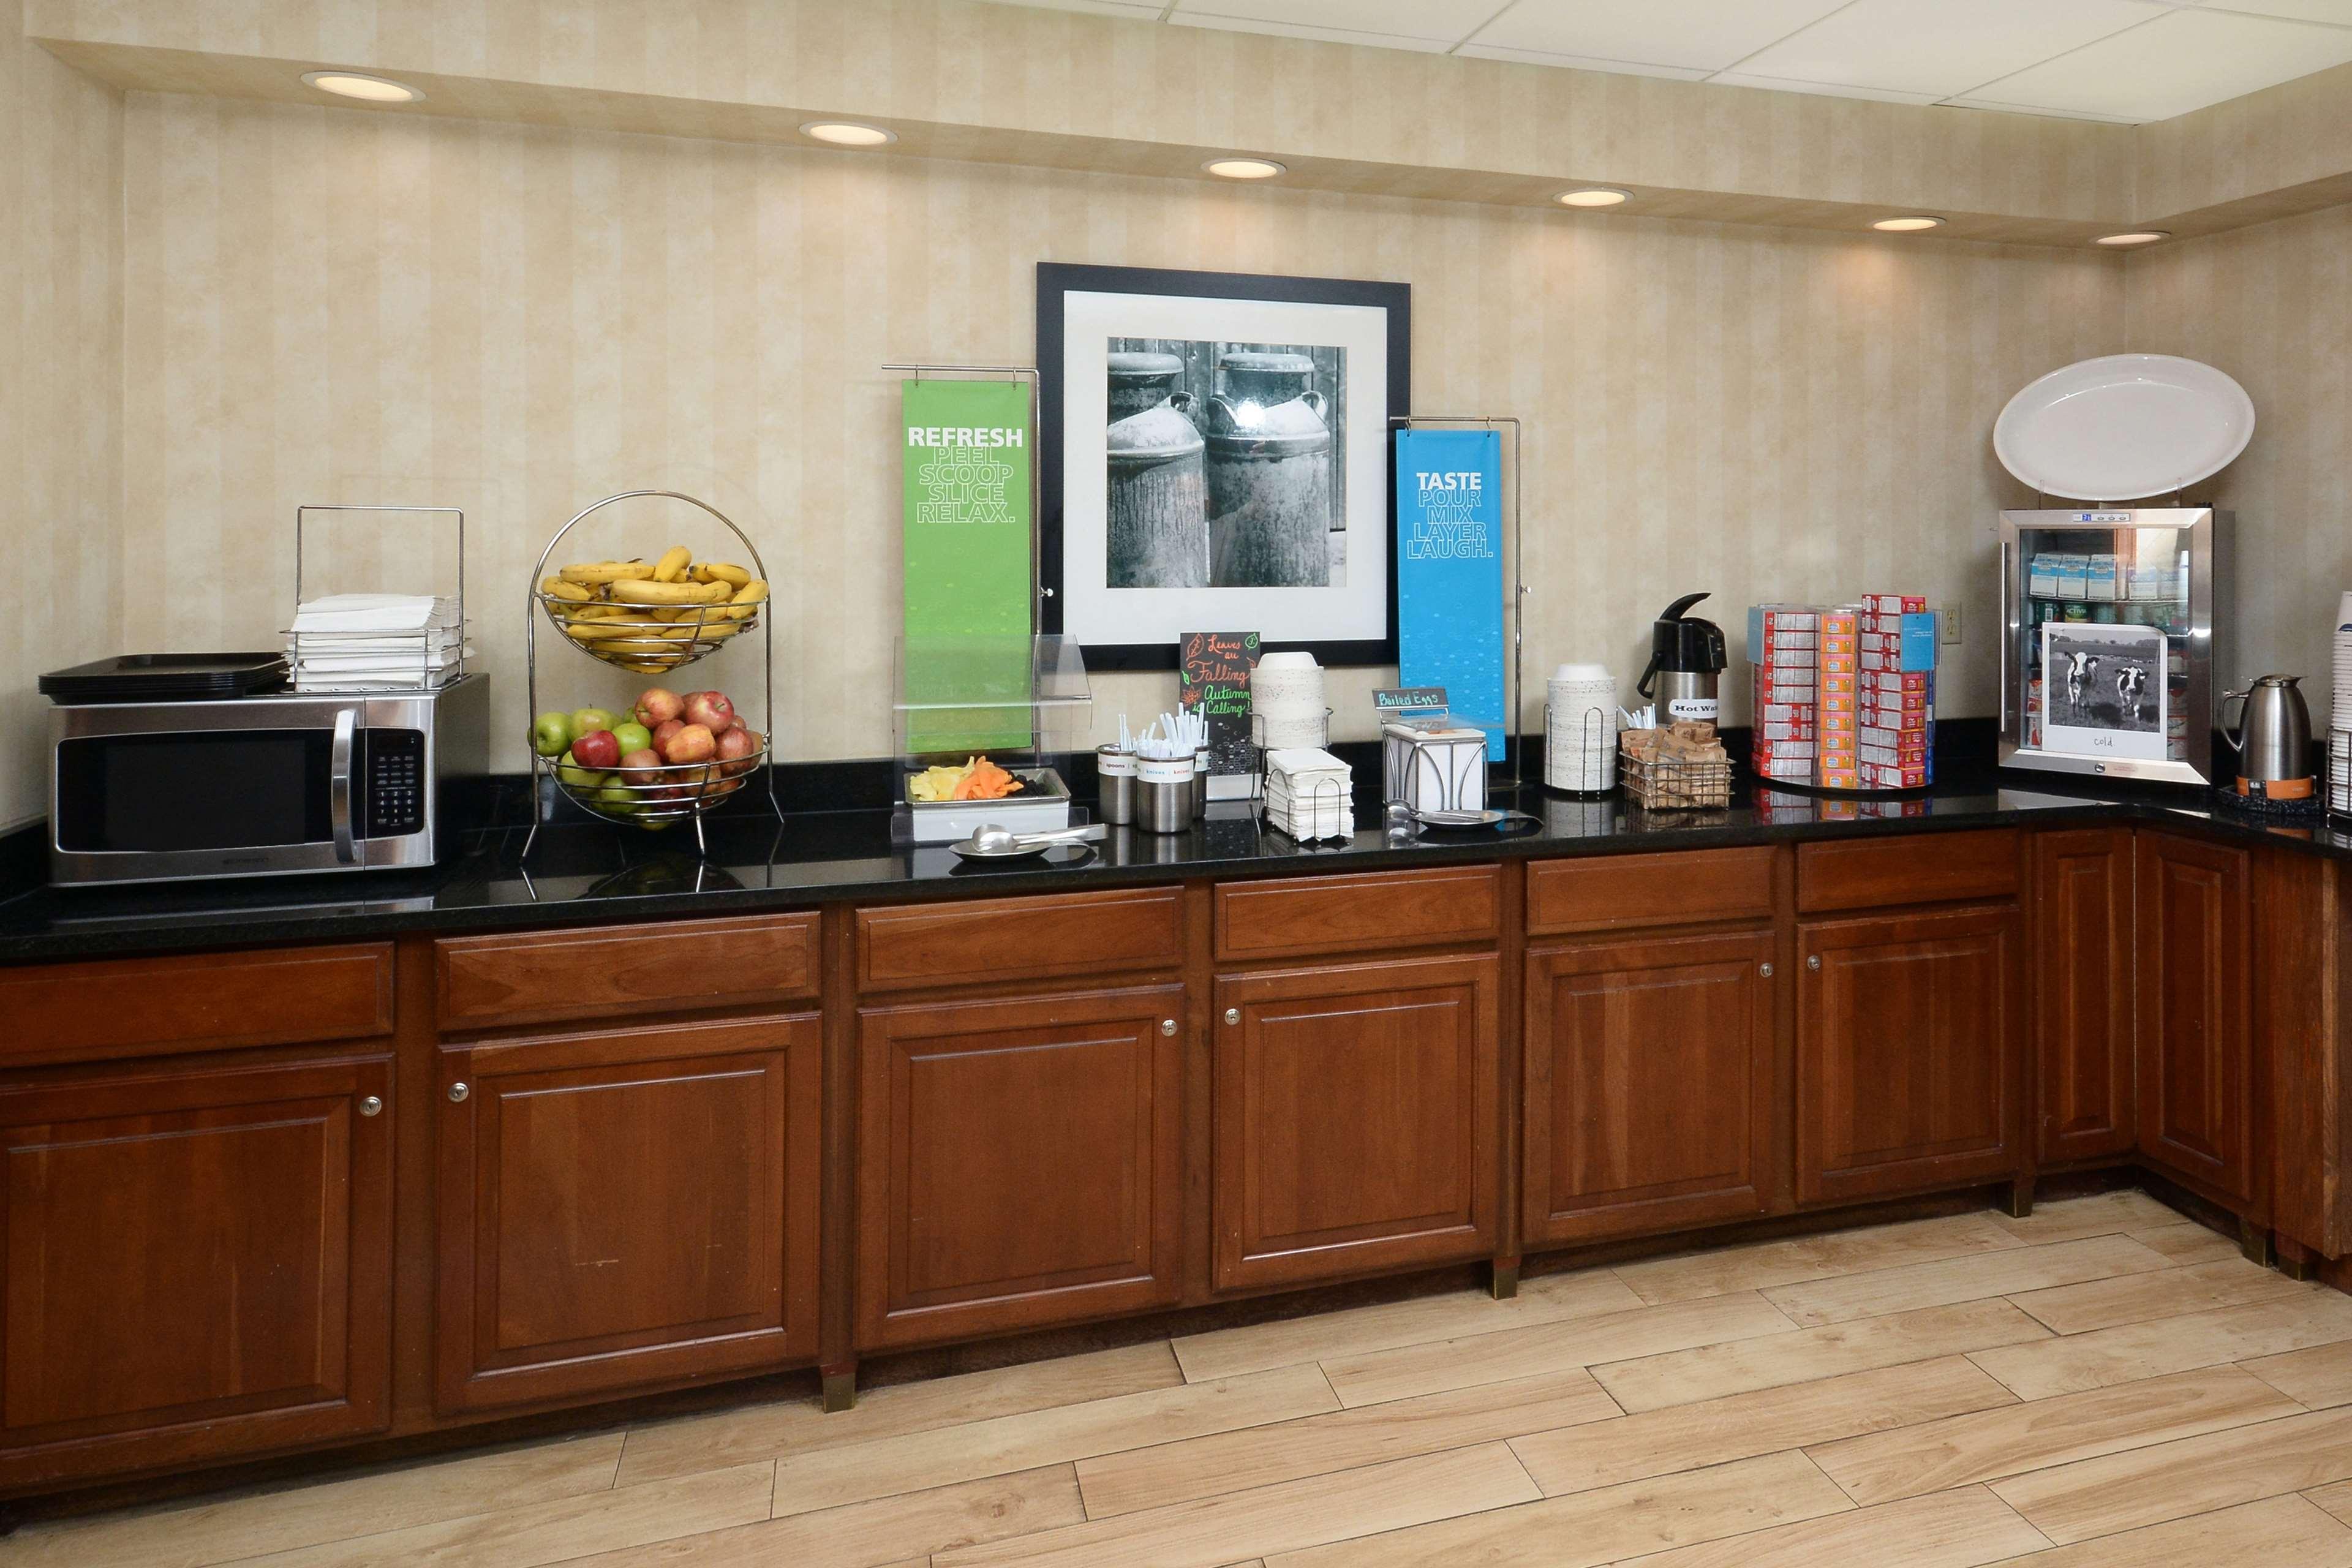 Hampton Inn & Suites Greenville/Spartanburg I-85 image 16